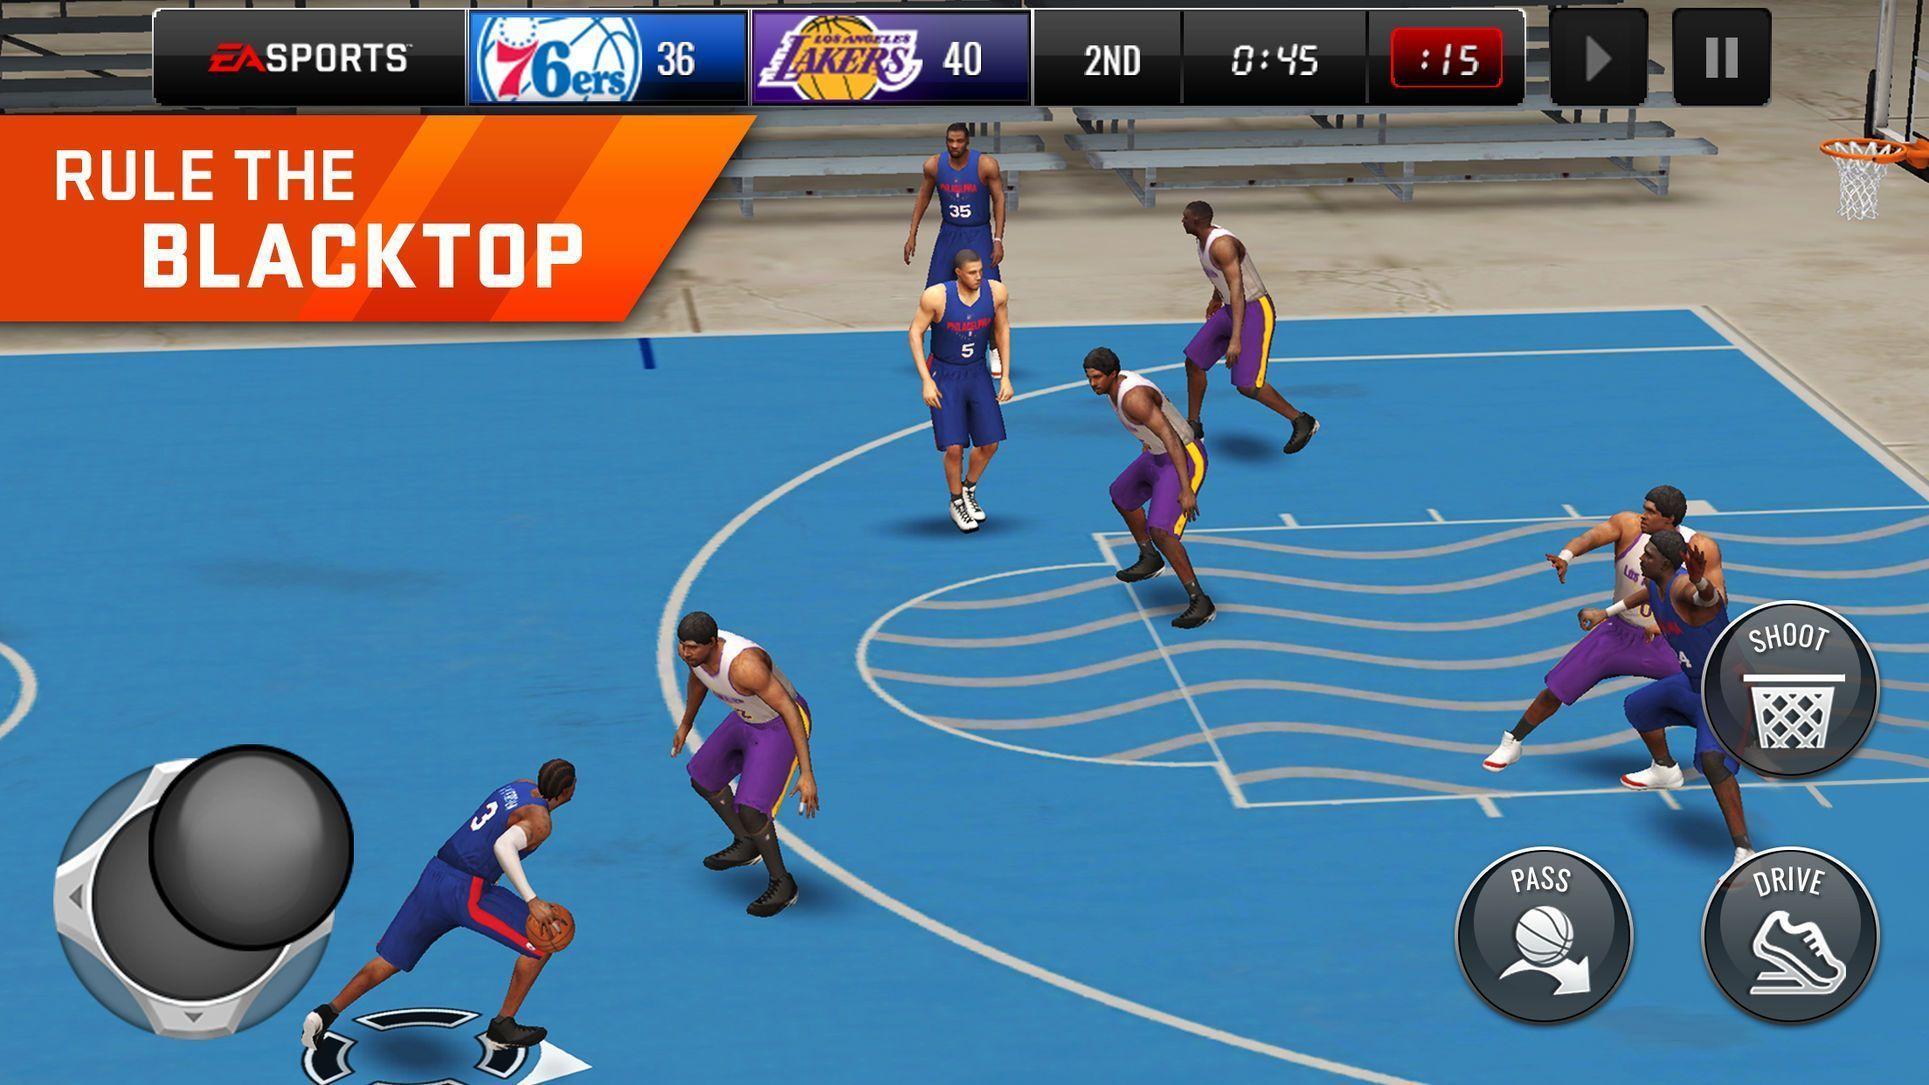 Nba Live Mobile Basketball Games Arts Sports Ios Basketballgamesonline Basketballonline Basketball Games Online Basketball Moves Basketball